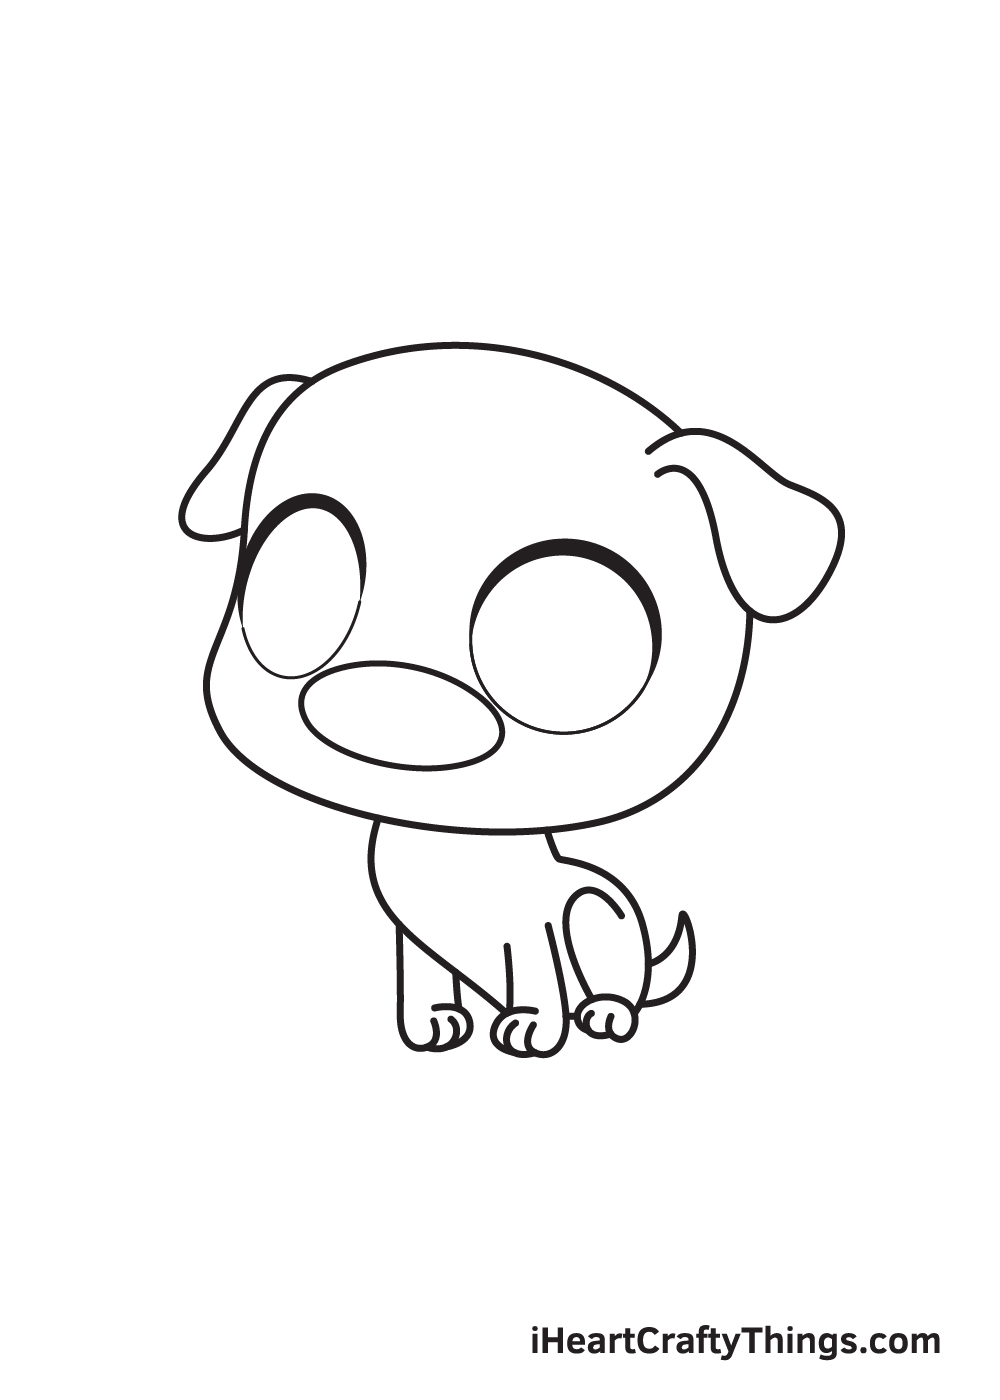 pug drawing step 7